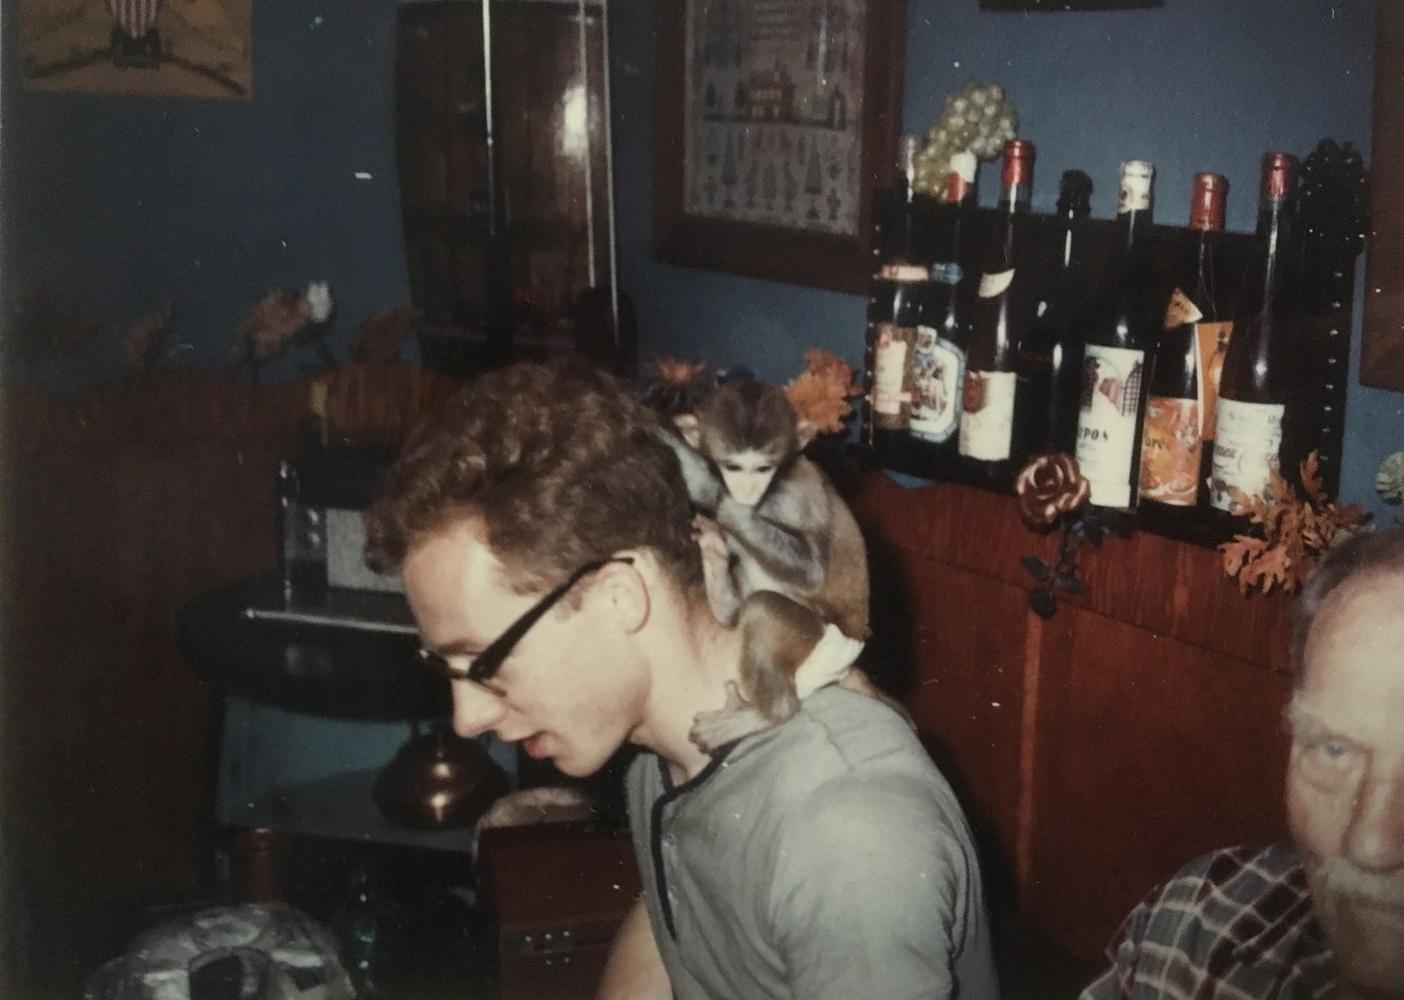 Kurt W. Fischer pictured with his monkey, Frodi.